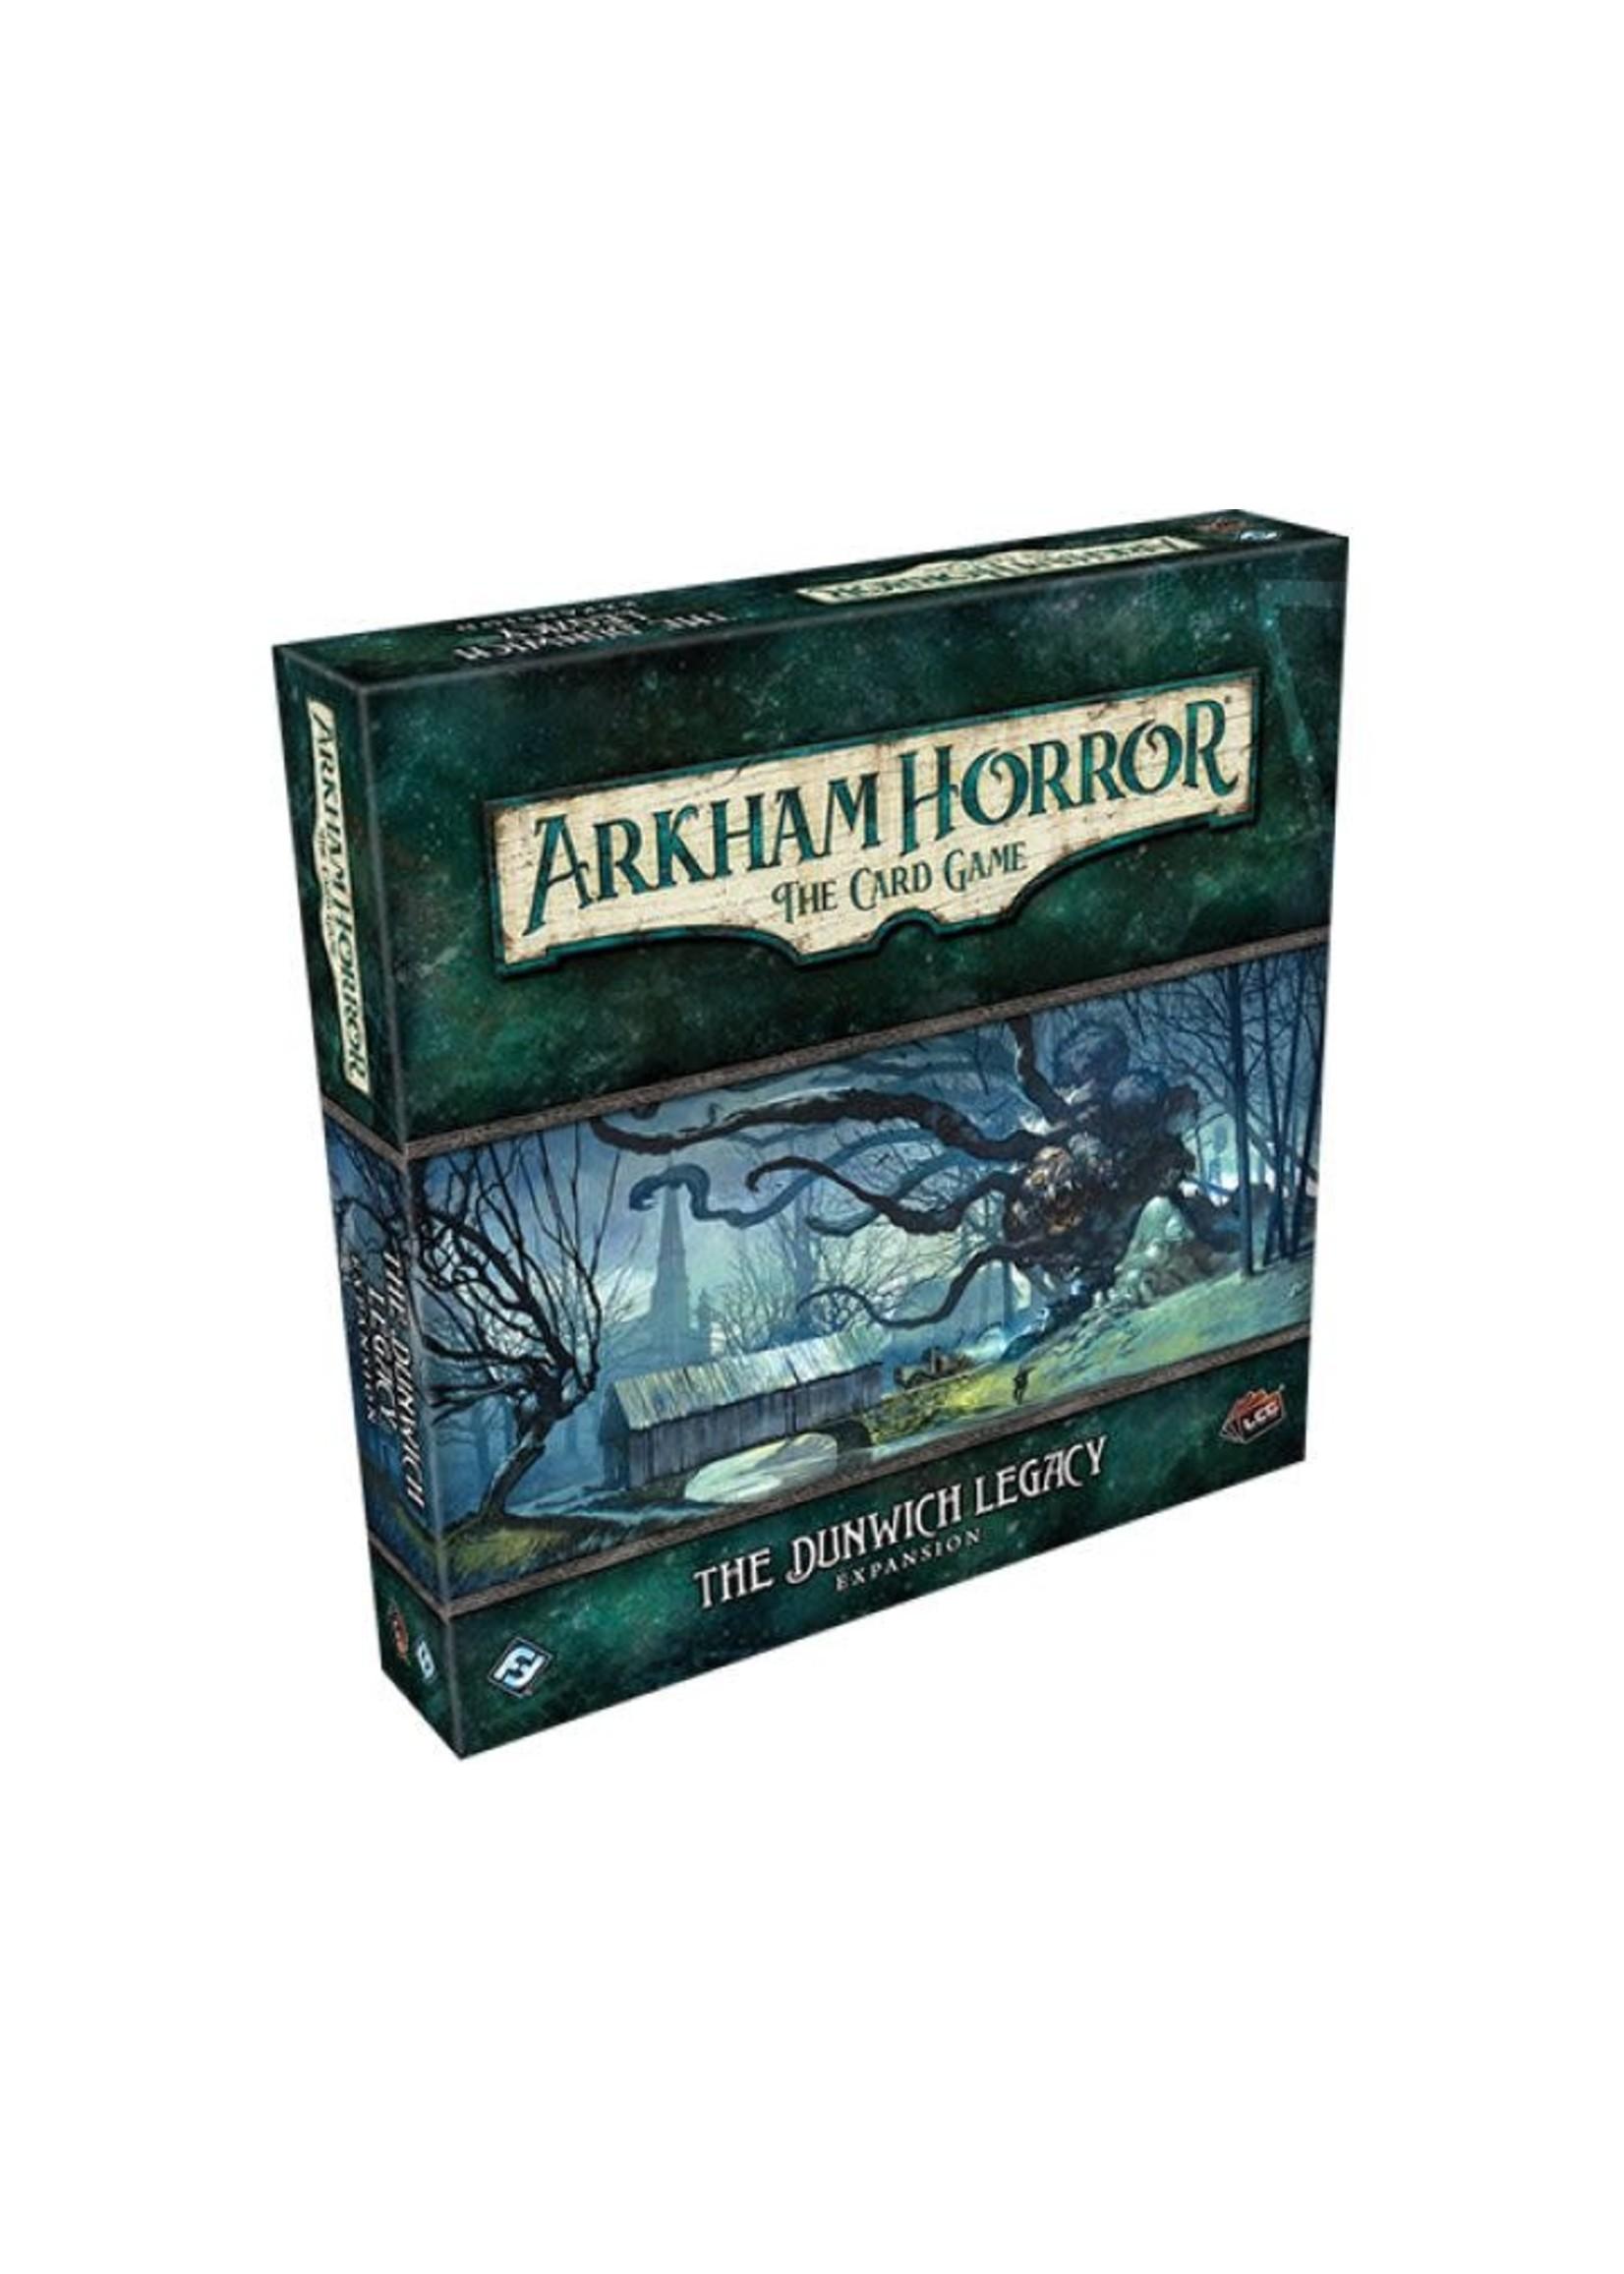 Arkham Horror Card Game The Dunwich Legacy